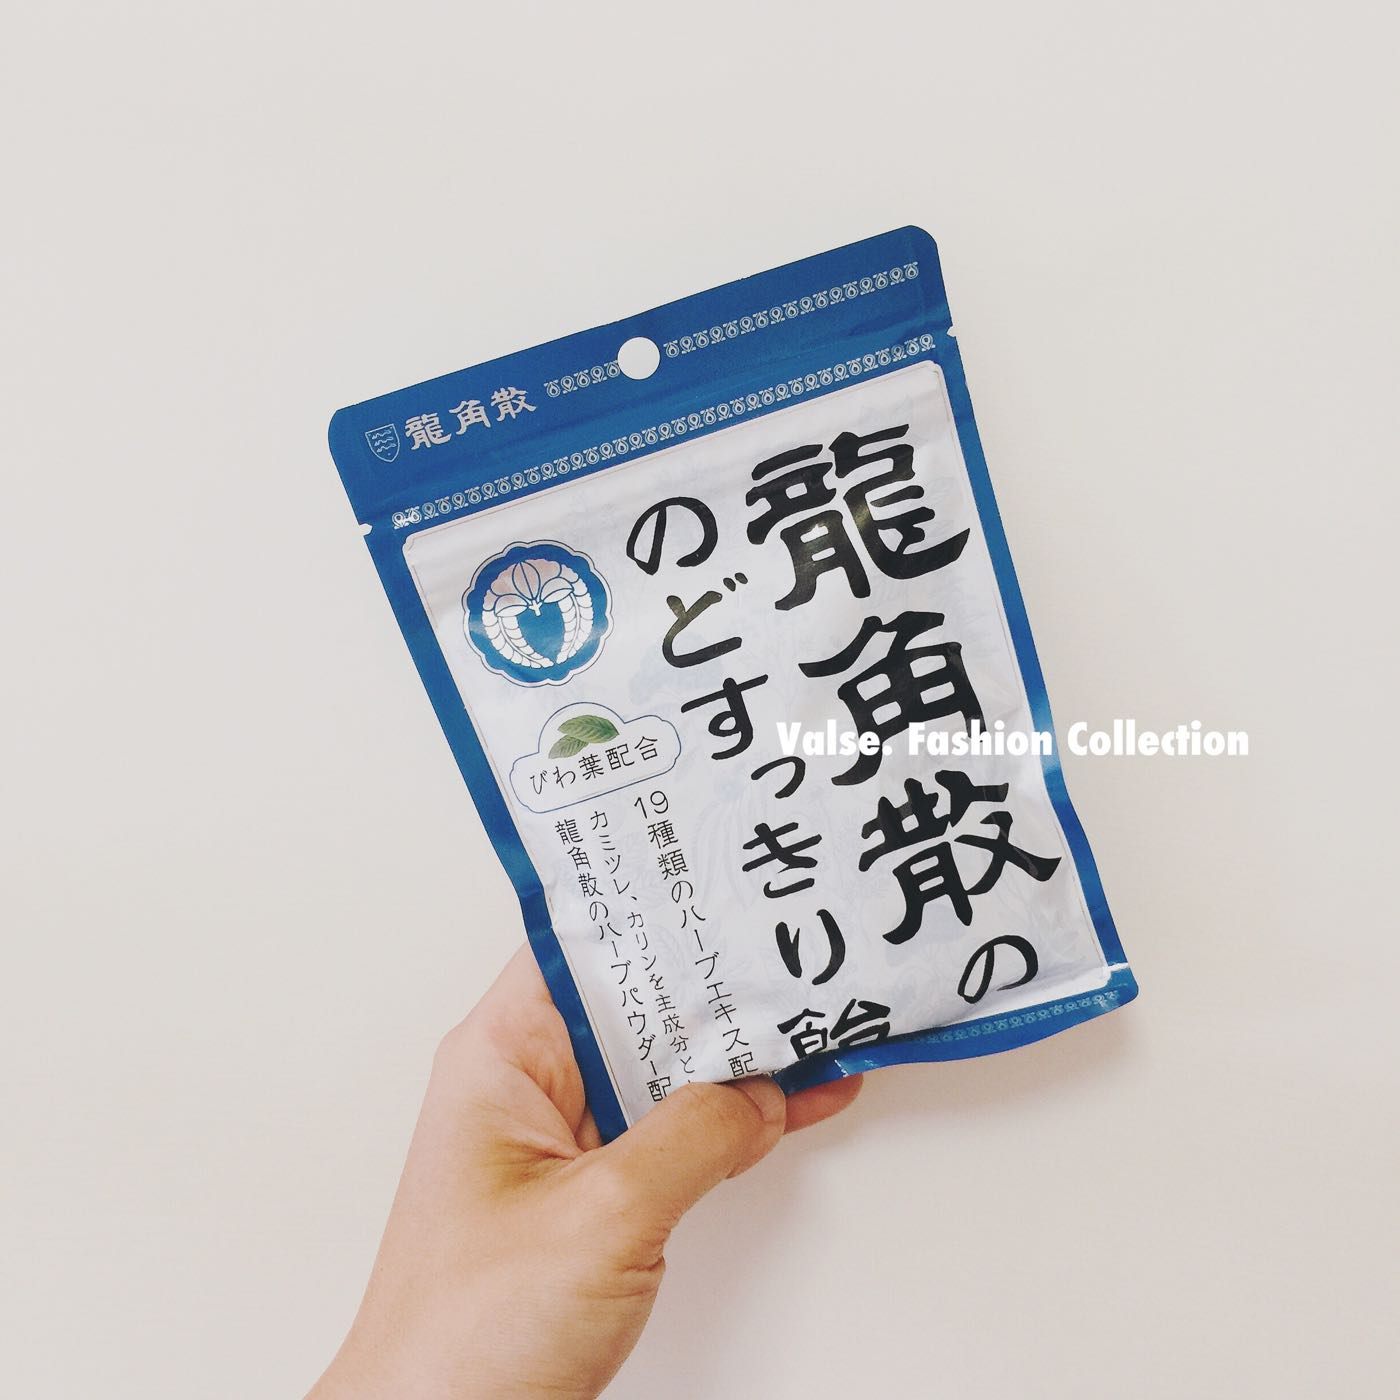 ⭐️現貨⭐️日本龍角散袋裝喉糖 薄荷草本喉糖100g